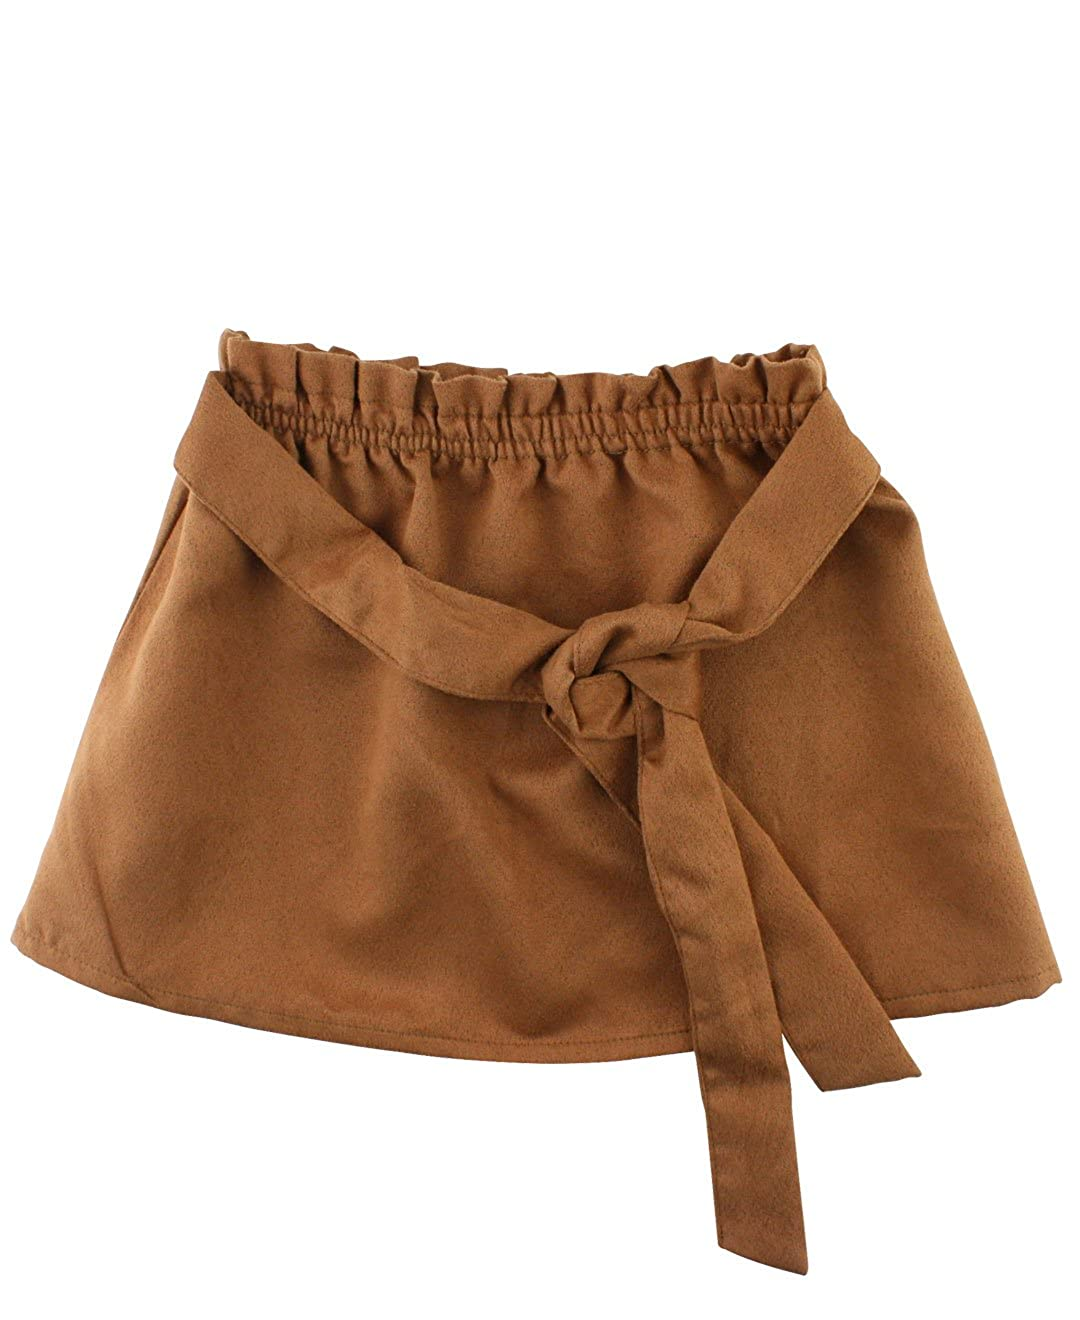 RuffleButts Baby//Toddler Girls Paperbag Elastic Waist Skirt w//Tie SKDYYXX-PAPR-SC-BABY